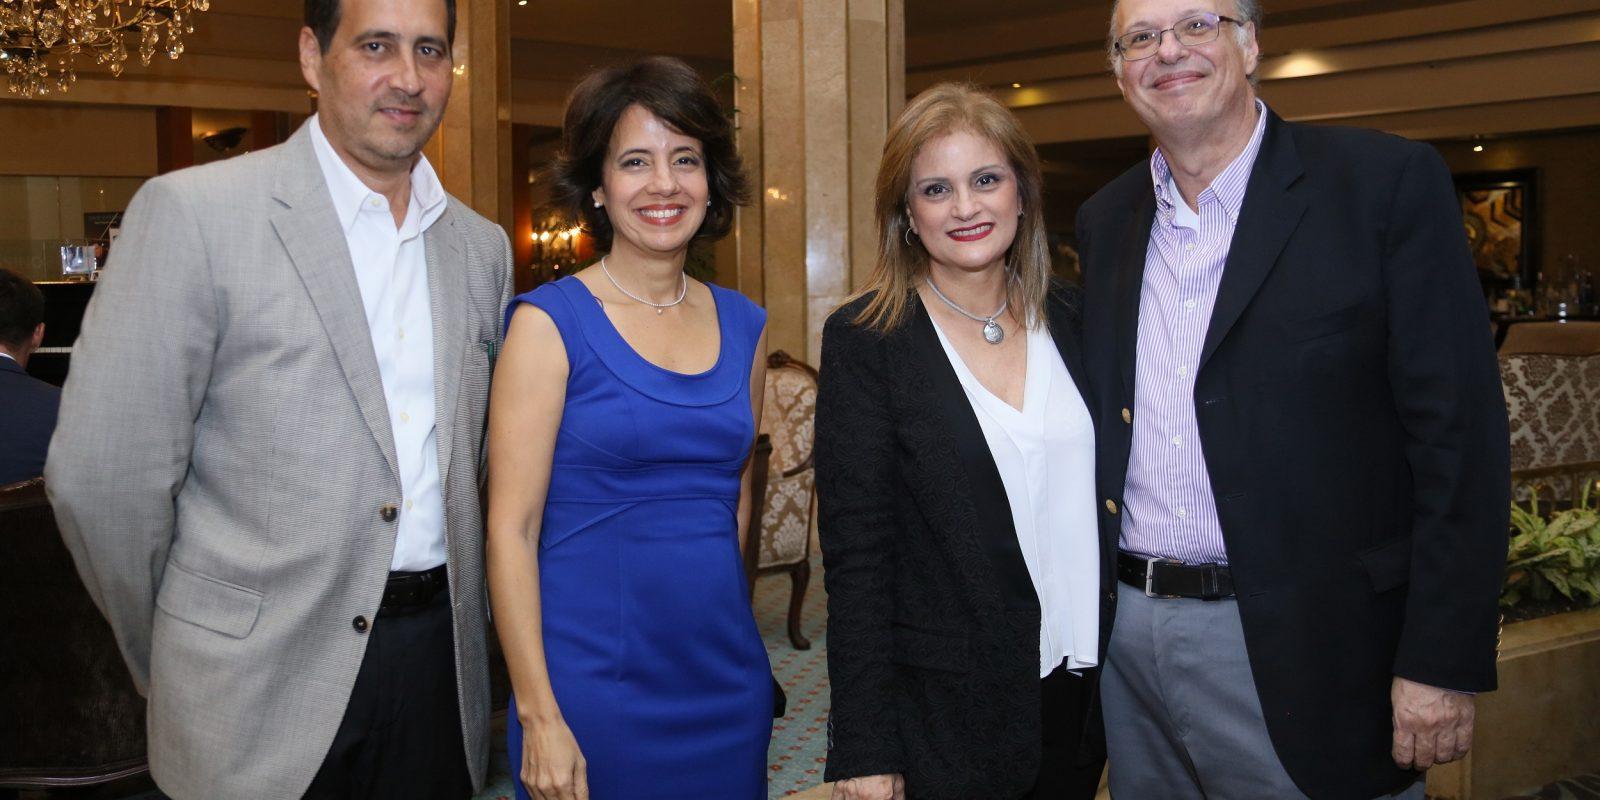 Ivan Lezcano, Sara de Lezcano, Begona Minguez y Herbert Stern